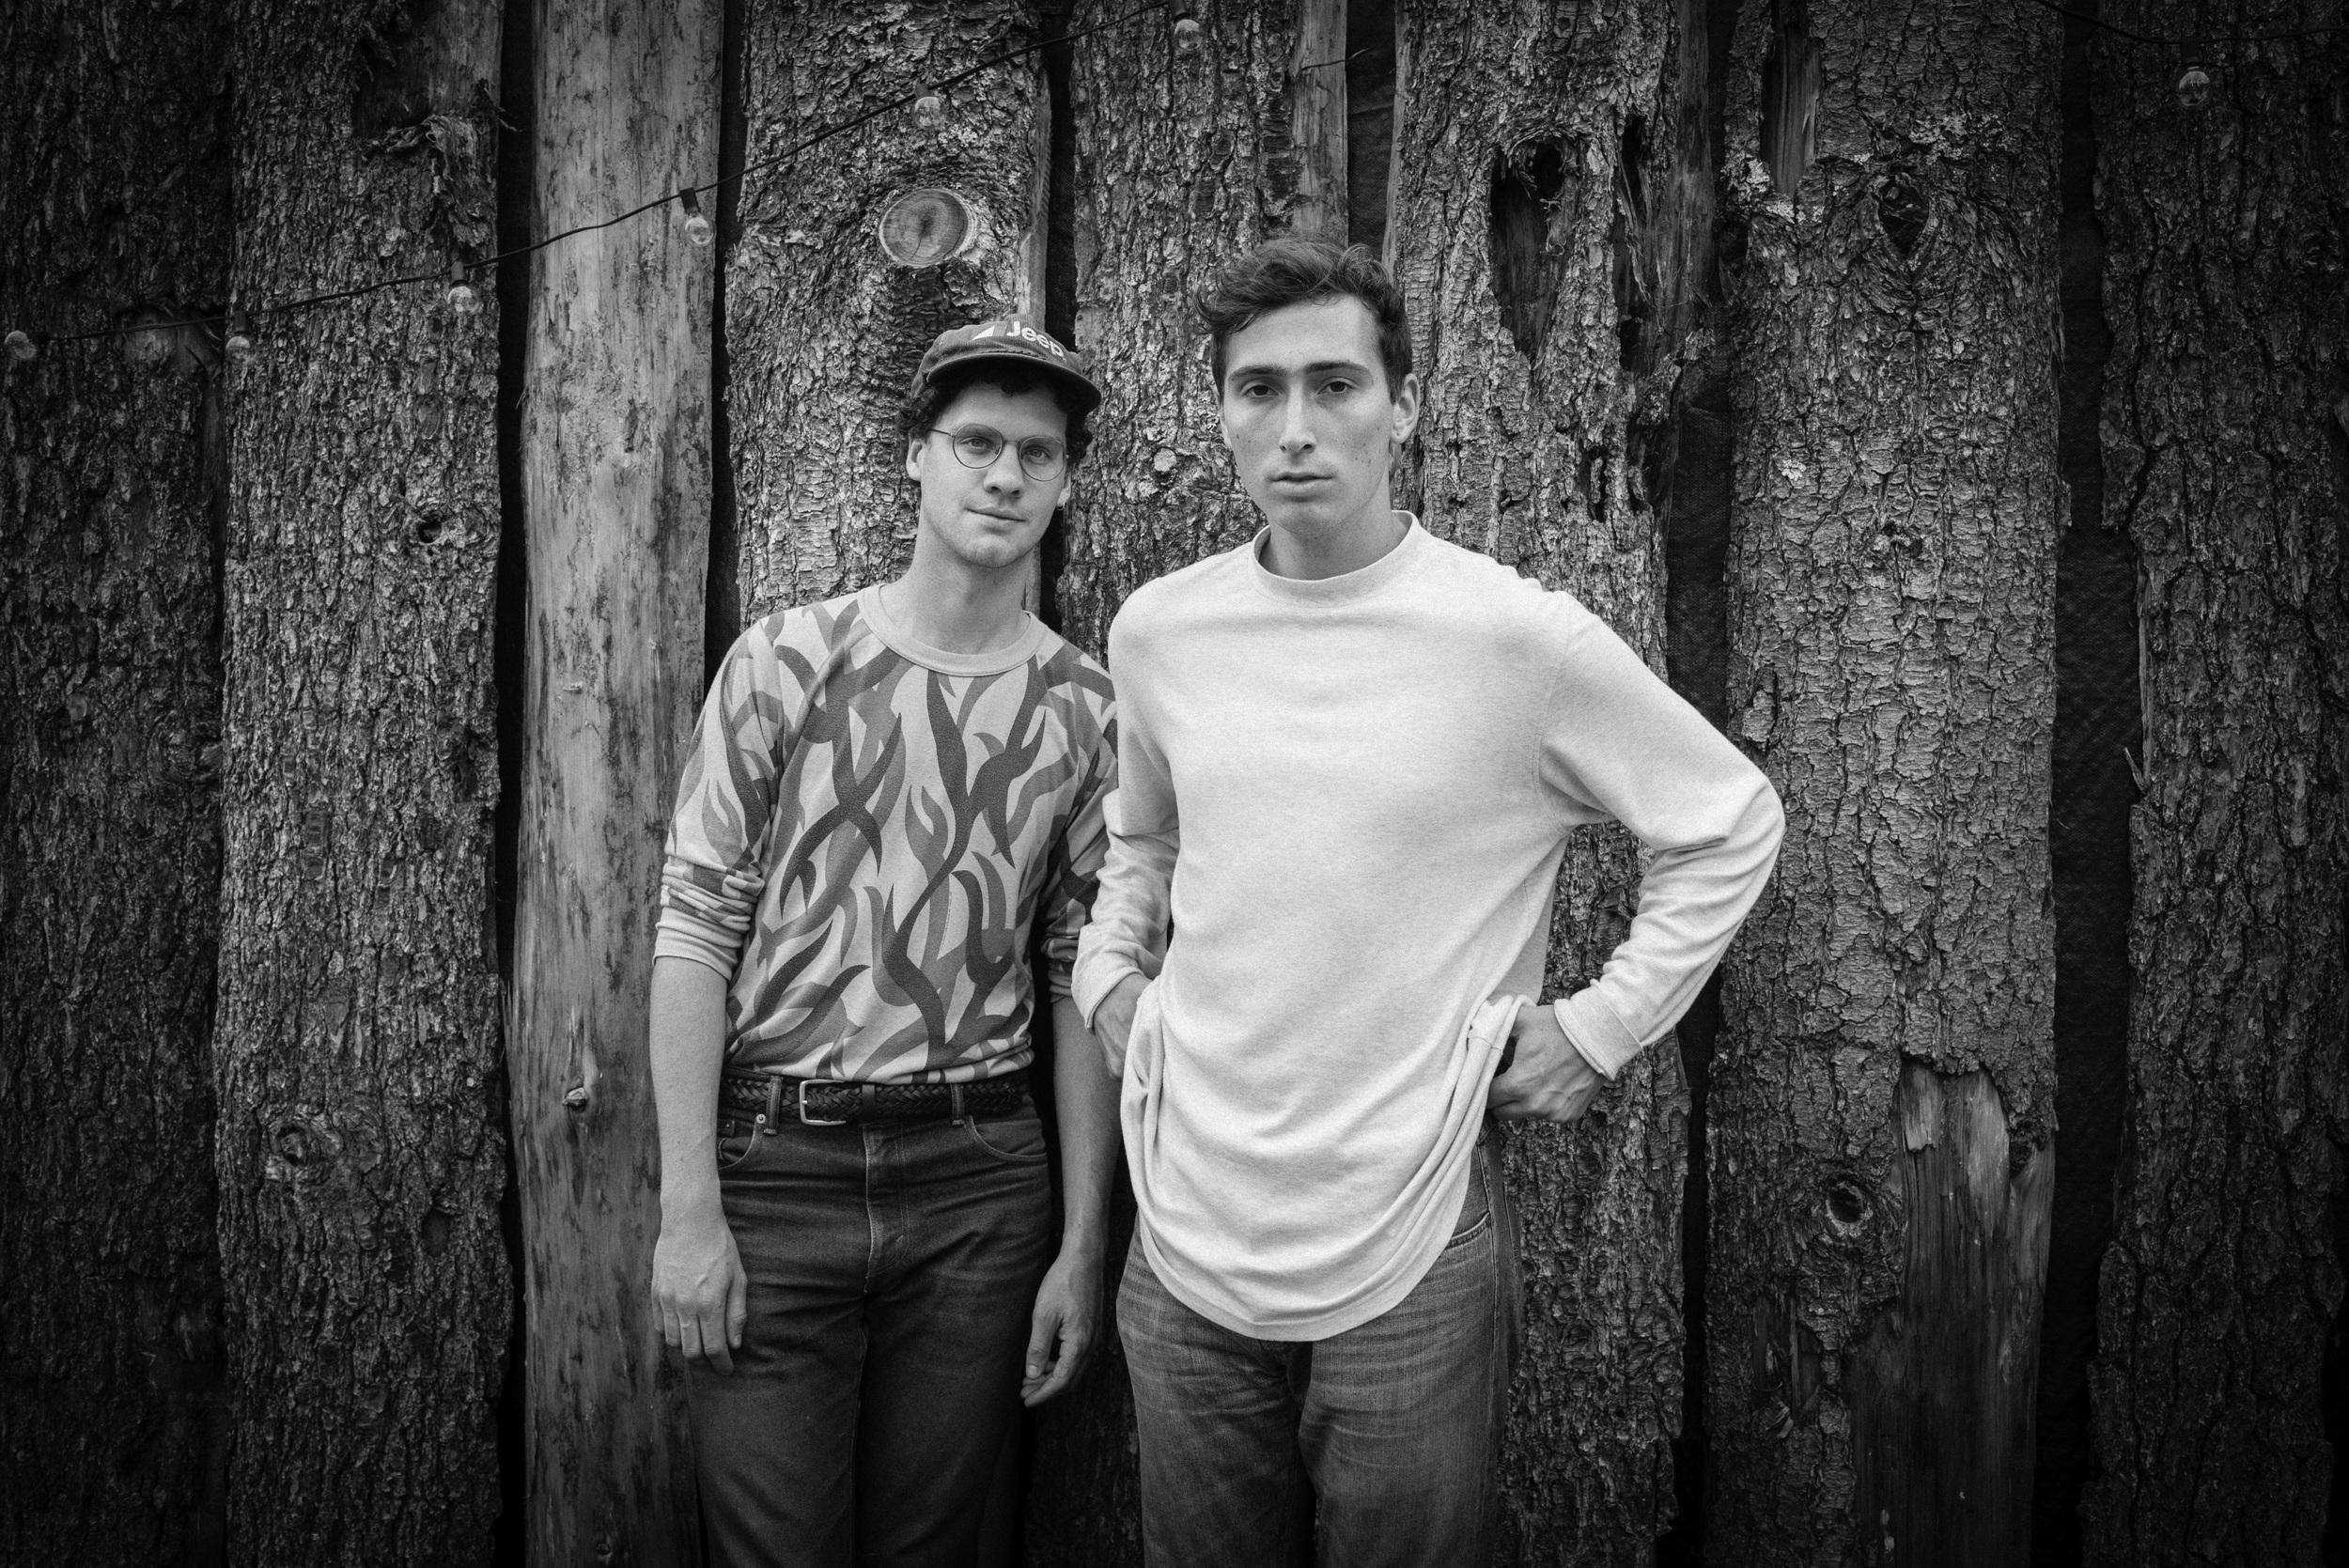 Max Kakacek (Left), Julien Ehrlich (Right) shot at the Brooklyn Bike Park.